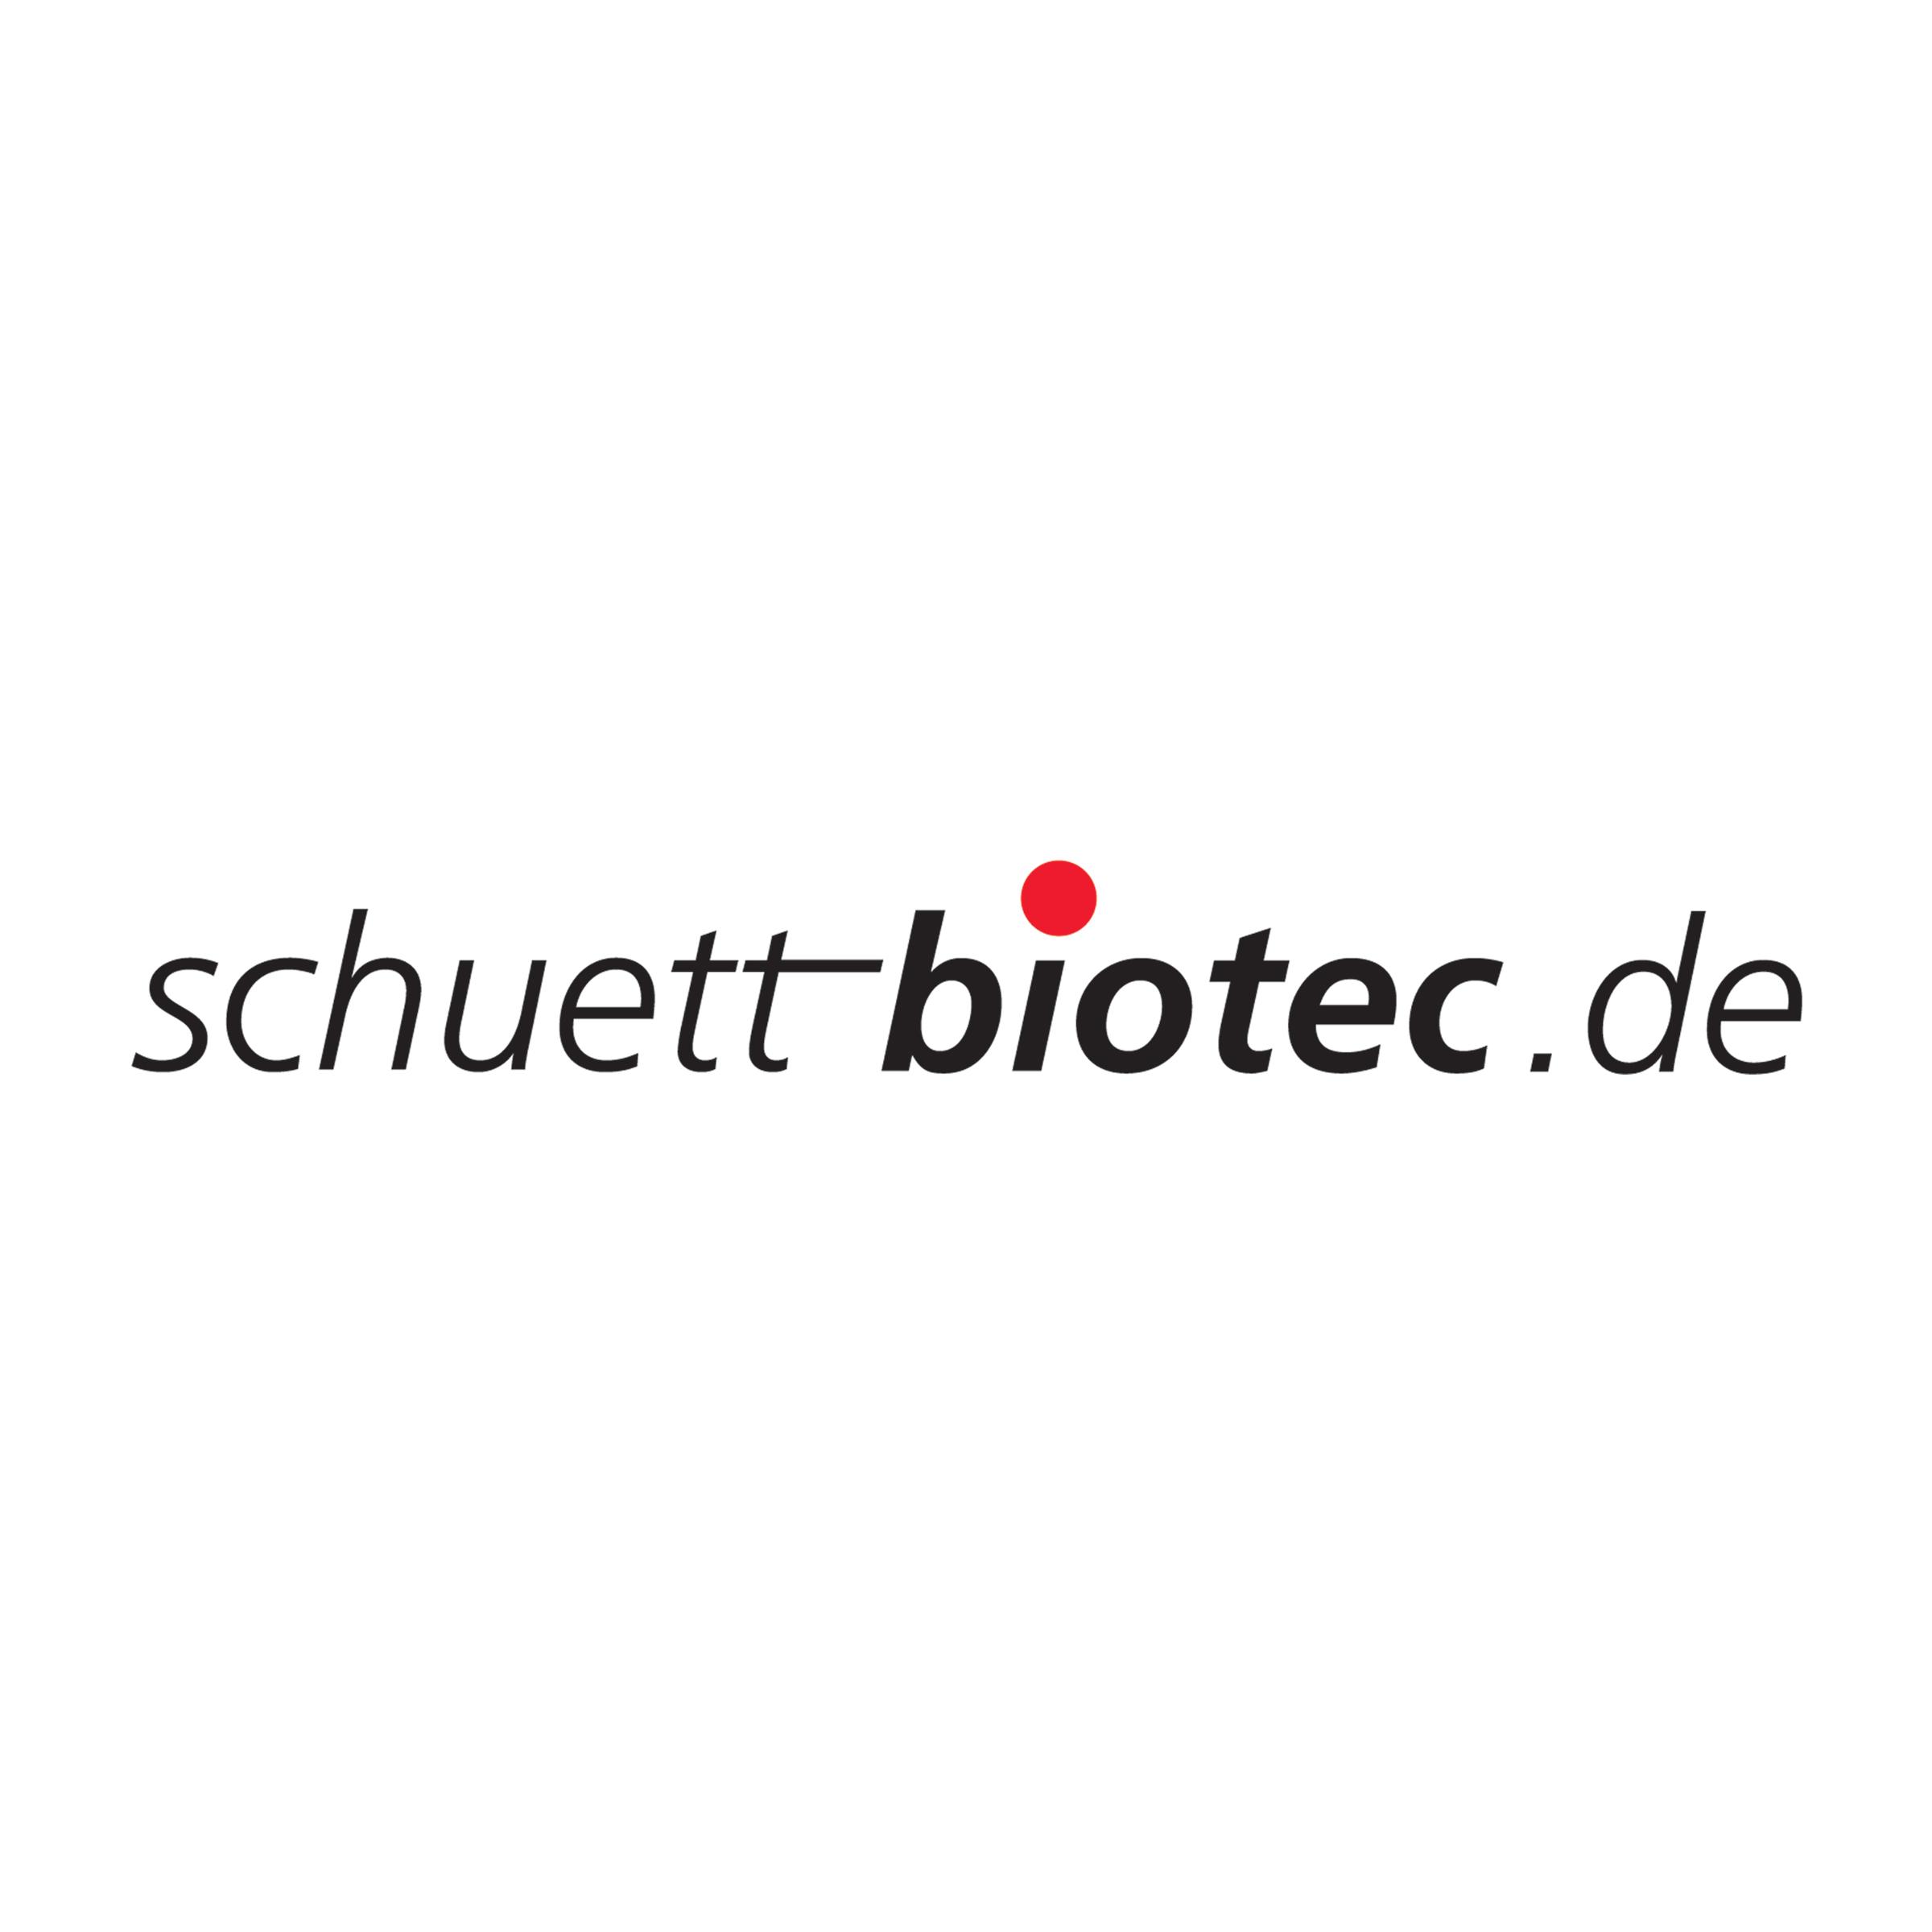 Schuett-Biotec